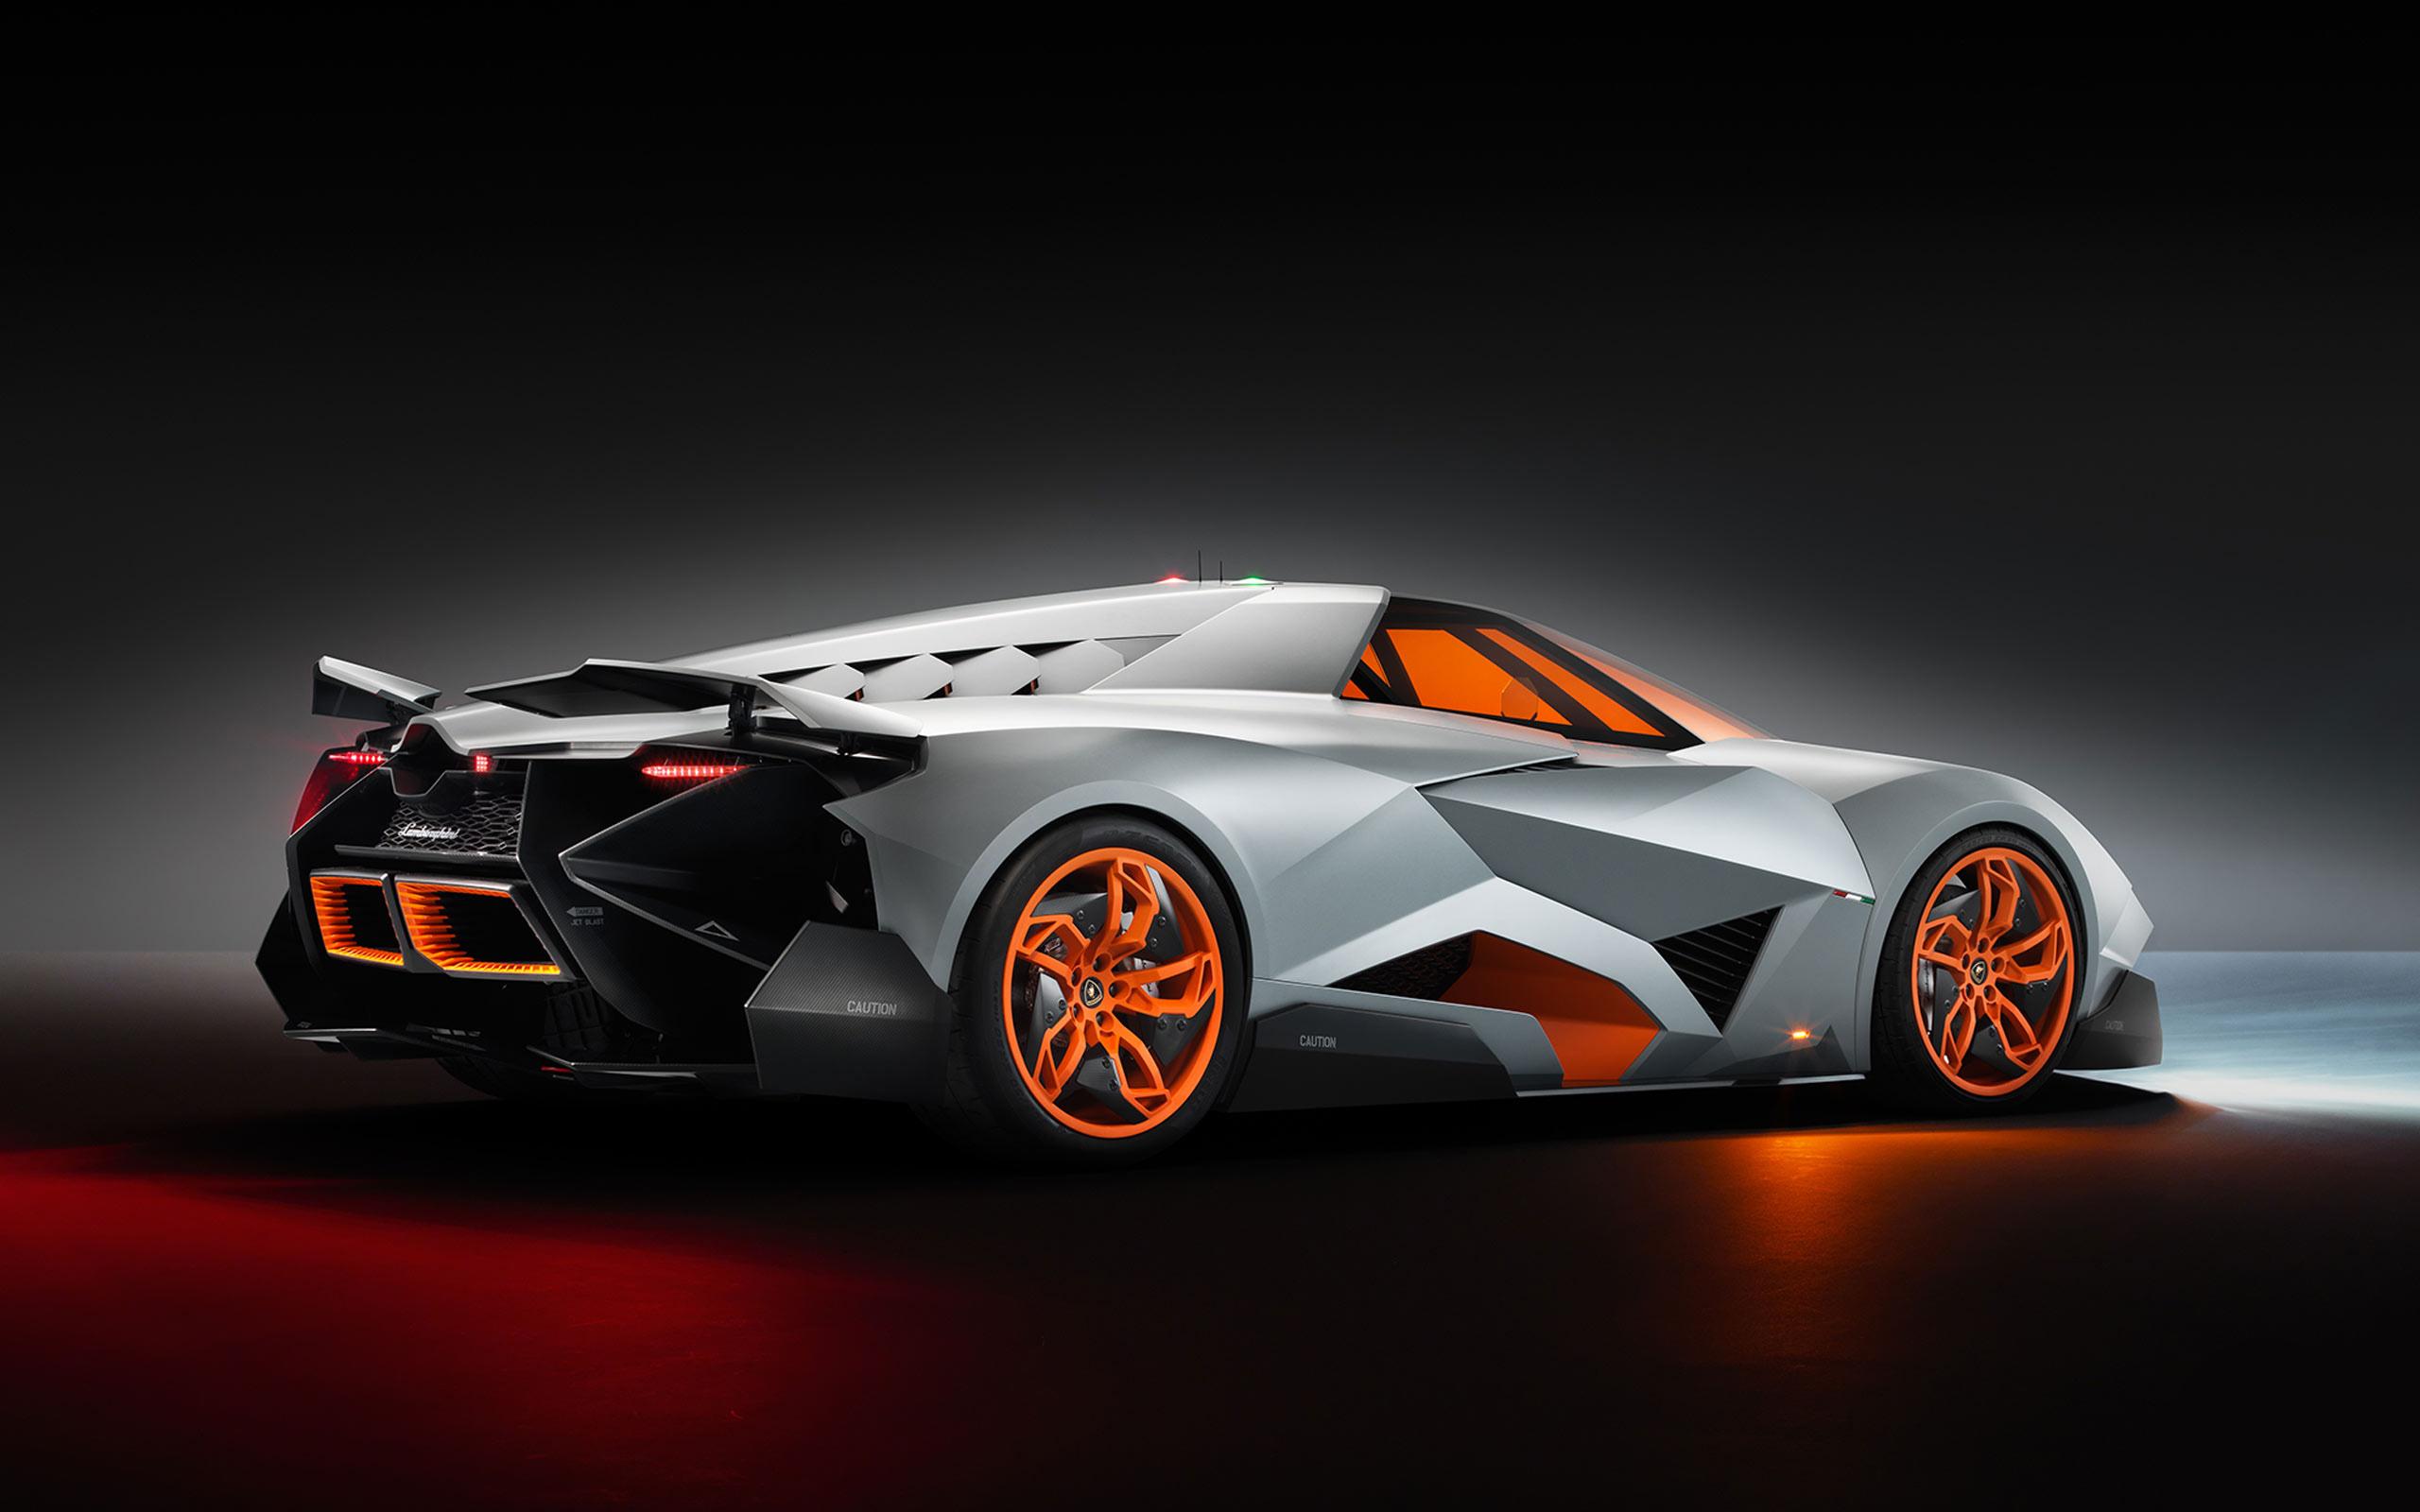 Charmant Lamborghini Egoista Concept 2